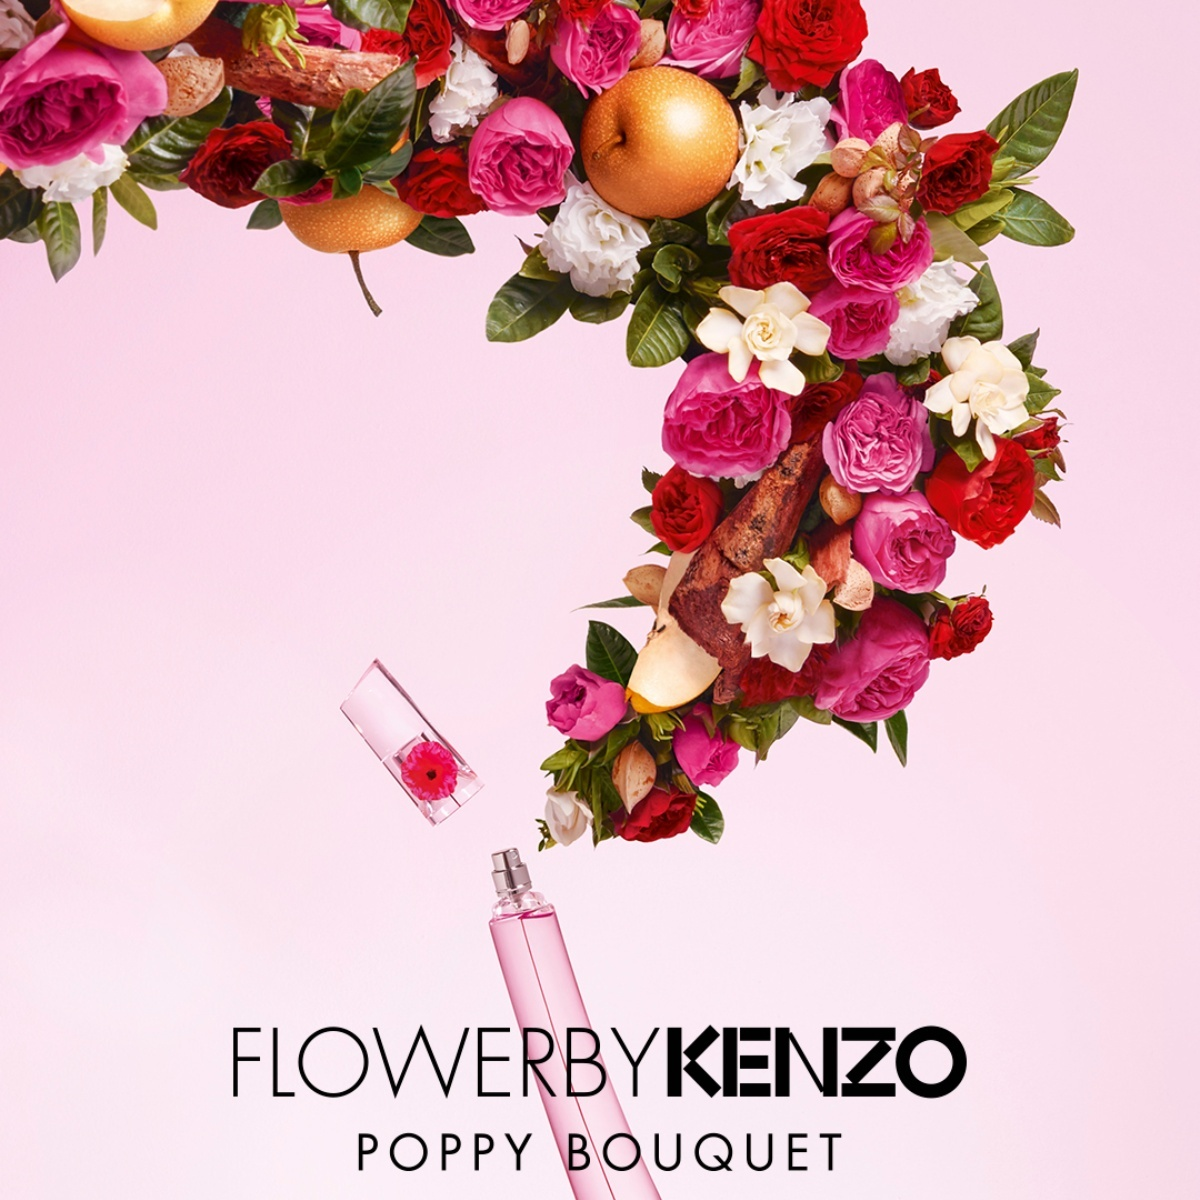 PERFUME PARA MUJER FLOWER BY KENZO POPPY BOUQUET EAU DE PARFUM